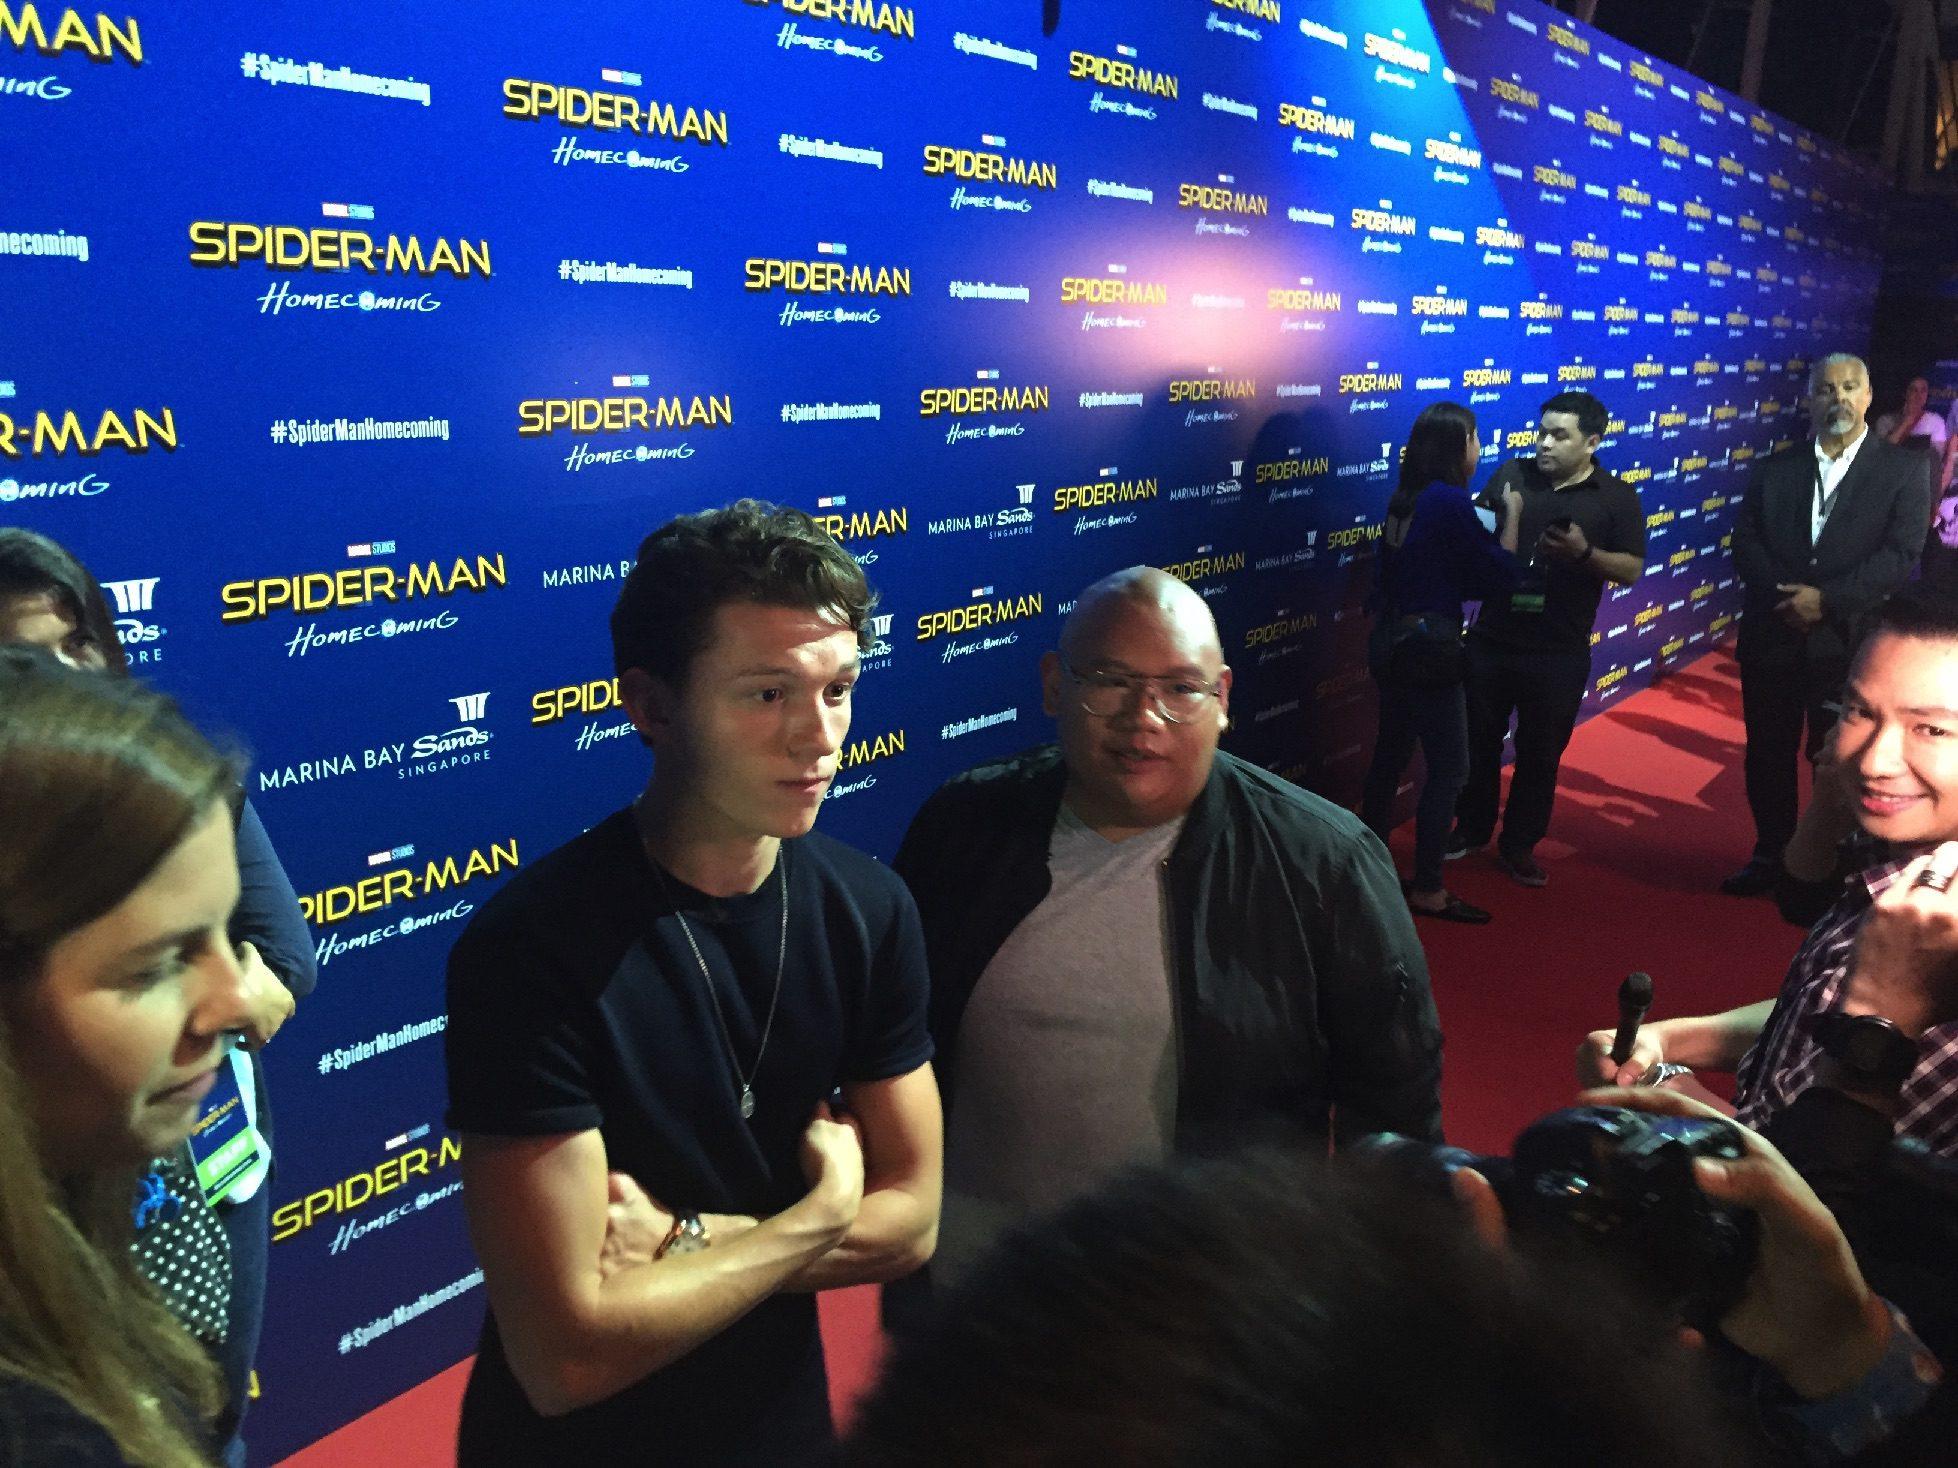 Tom Holland and Jacob Batalon.